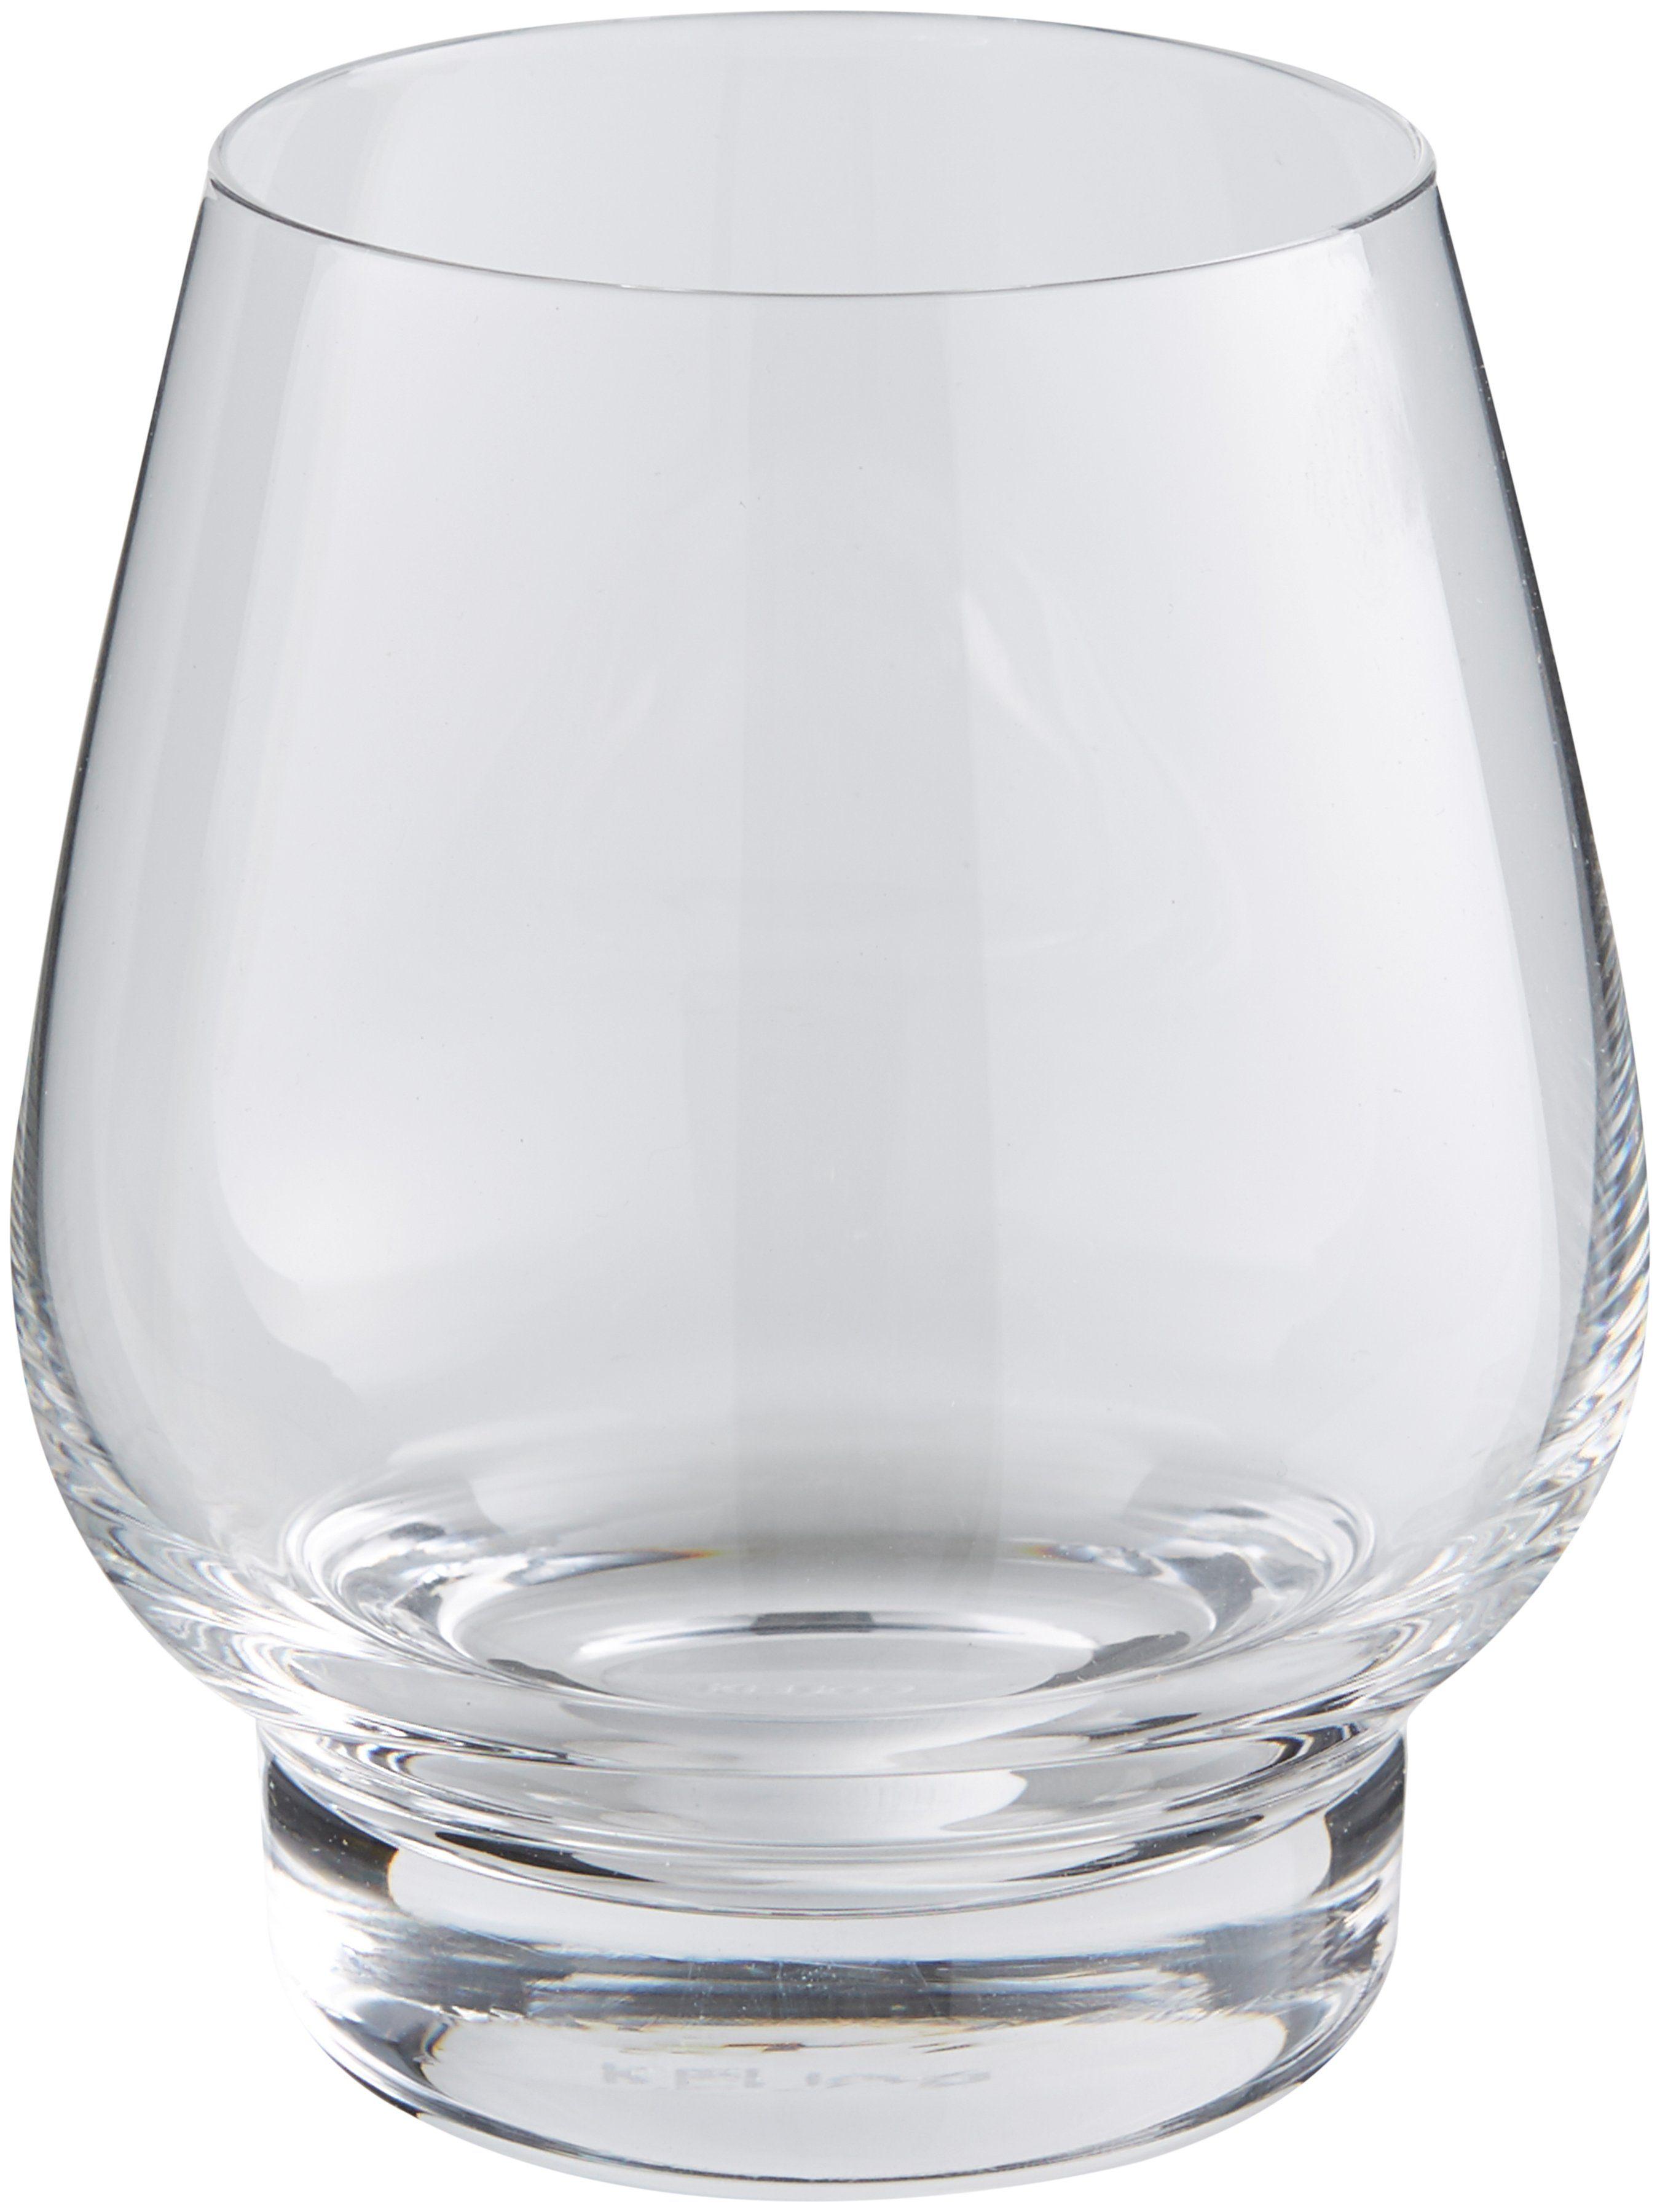 KEUCO Ersatzglas »Astor«, Echtkristall-Glas, lose